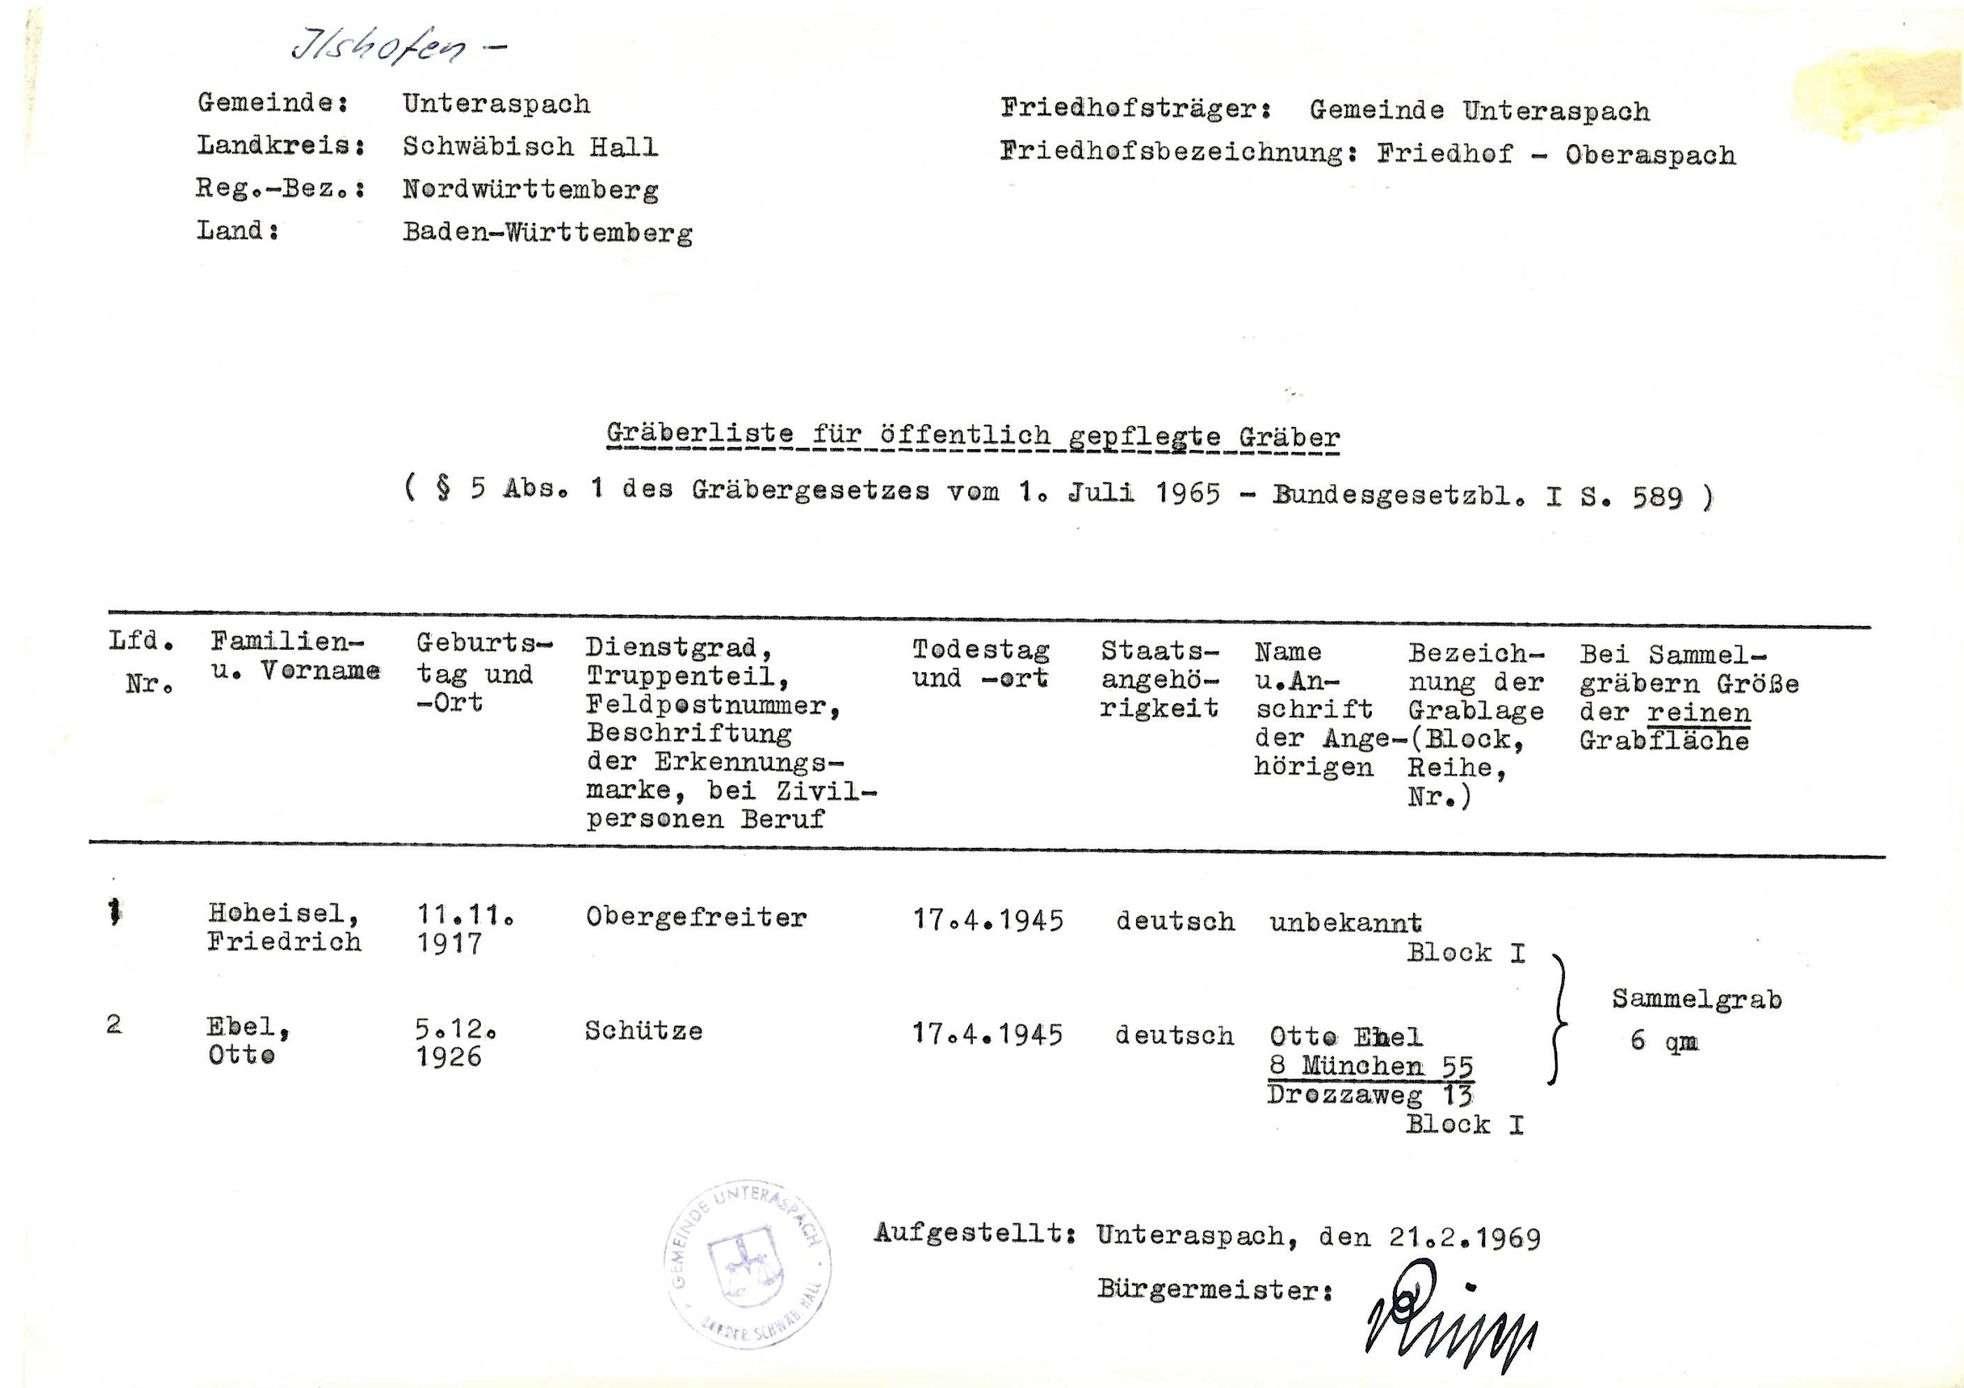 Oberaspach, Bild 1